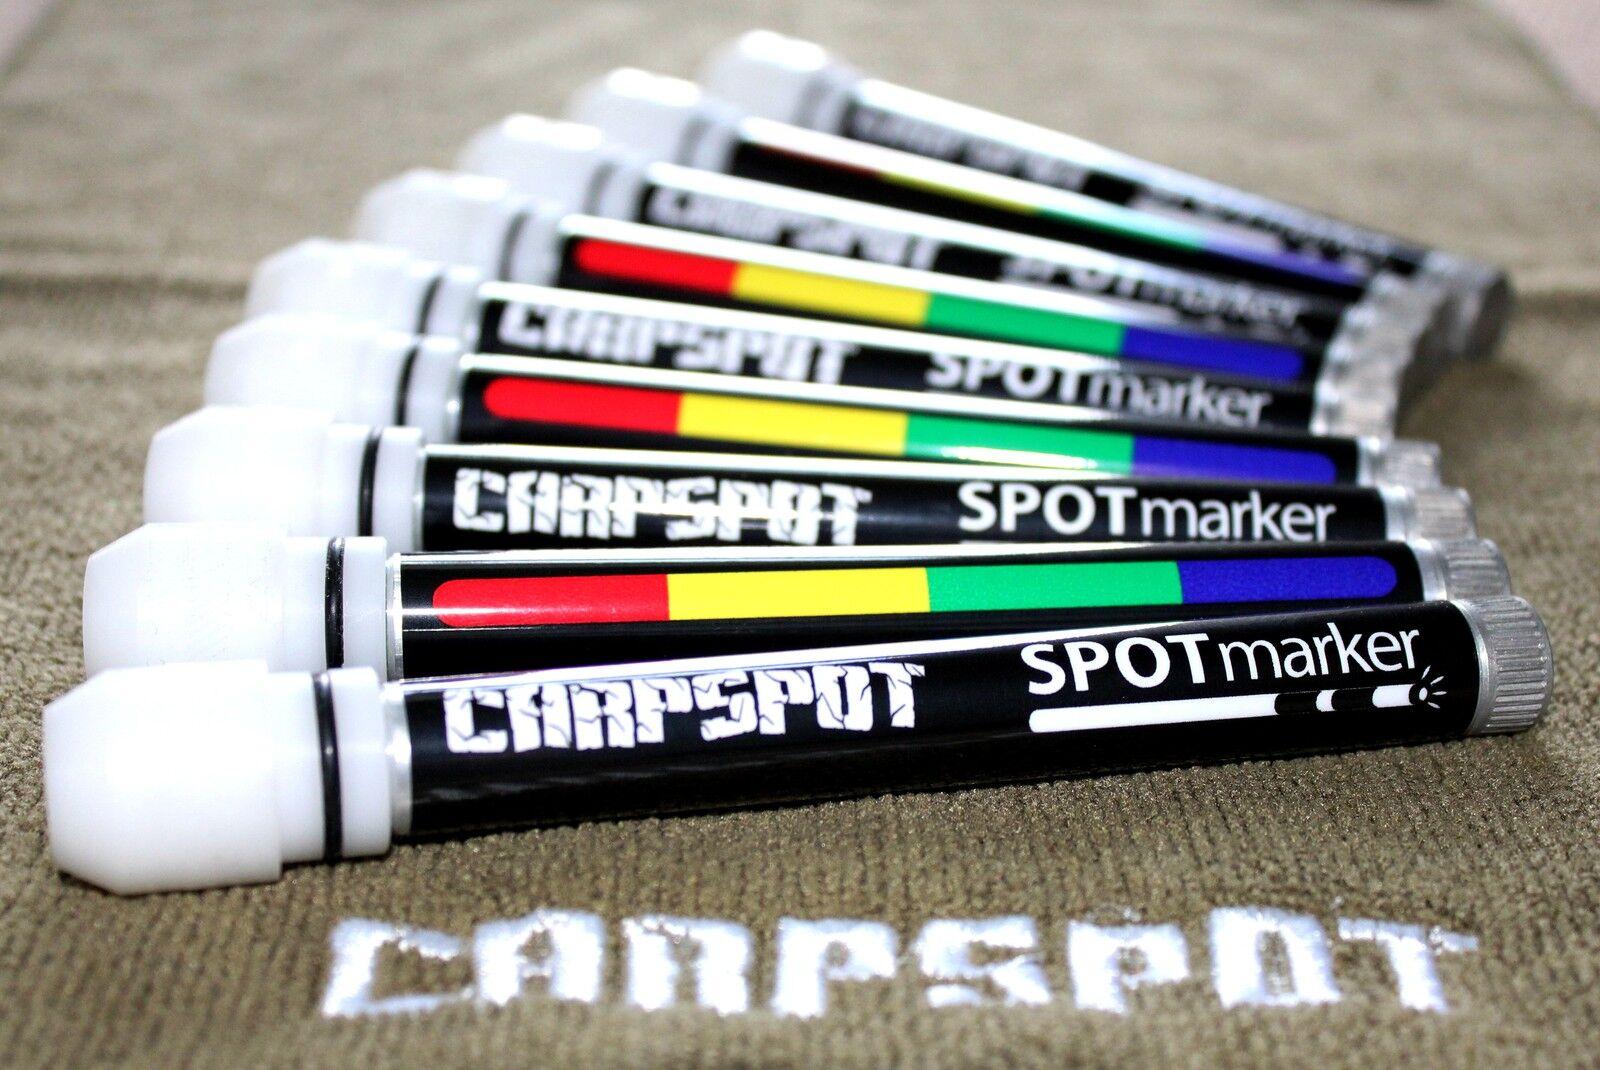 Carpspot Premium Marker Spotmarker 6,35m Stab Marker Premium + Tasche + 2kg Blei + Leuchtkopf 2b95f4